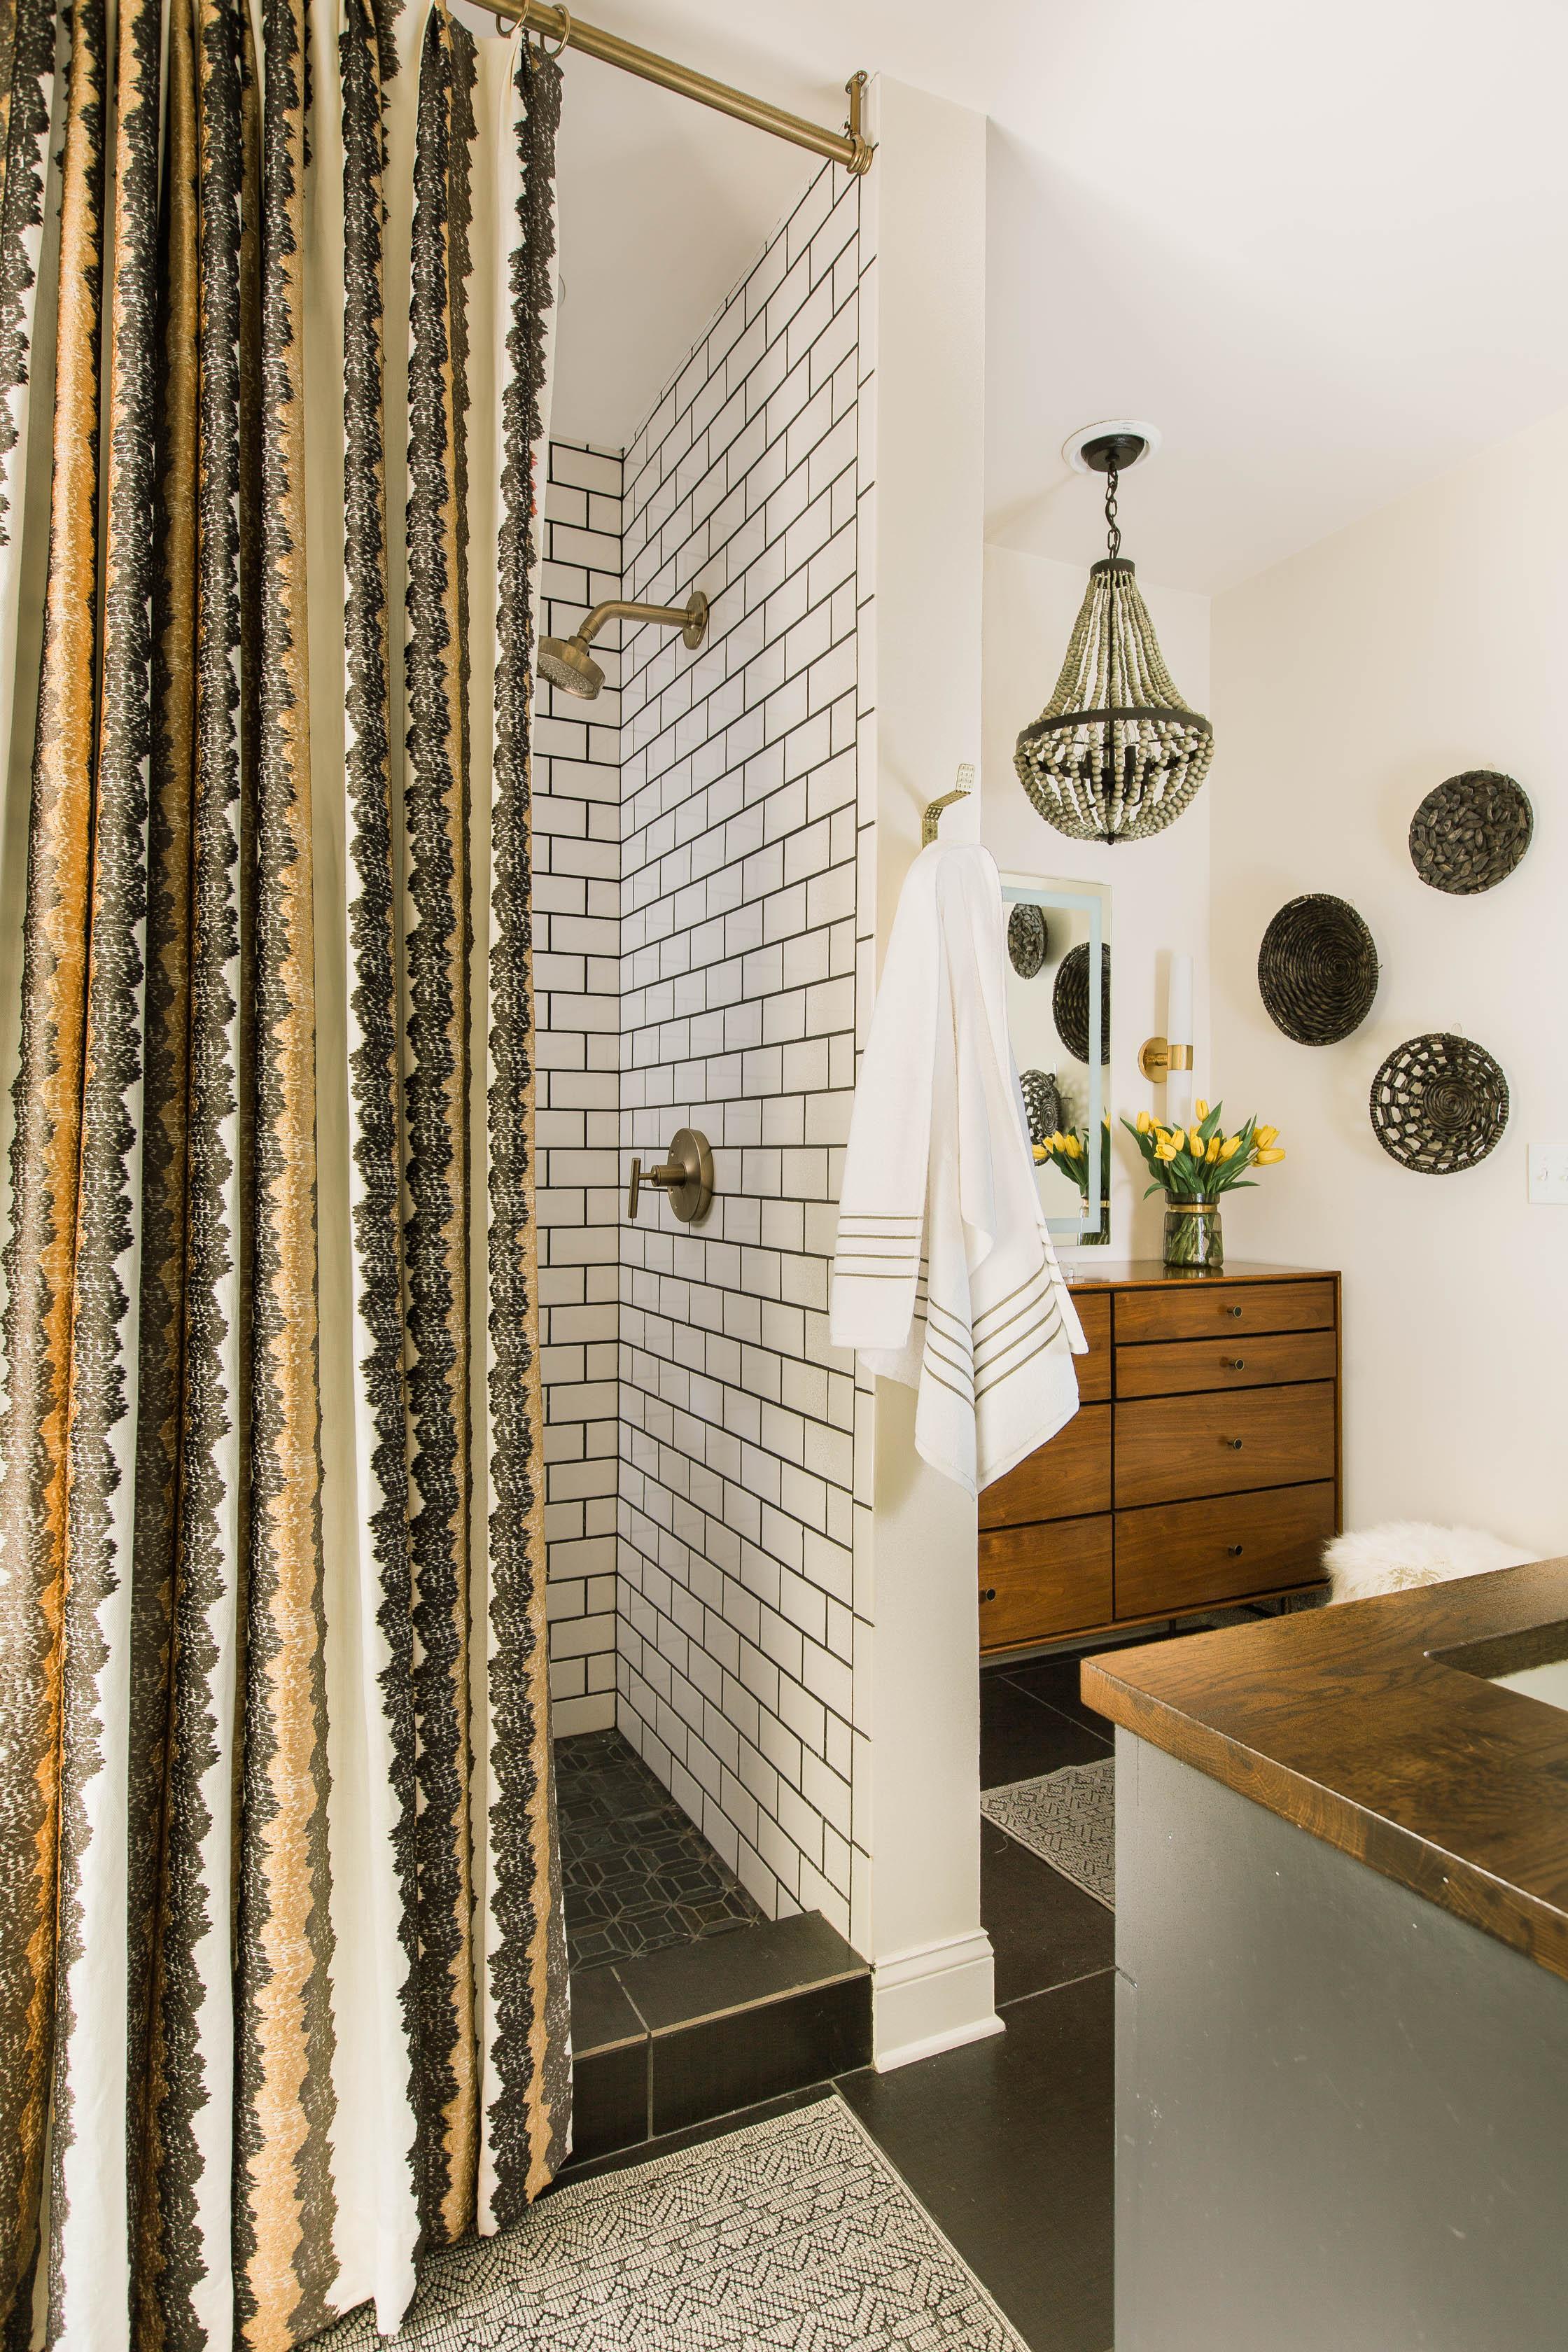 Dayka-Robinson-Brookside-Oak-Master-Bathroom-Renovation-Robert-Allen-Wavy-Stitch-West-Elm-Heston-Dresser-Subway-Tile-Brass-Kohler-112015.jpg